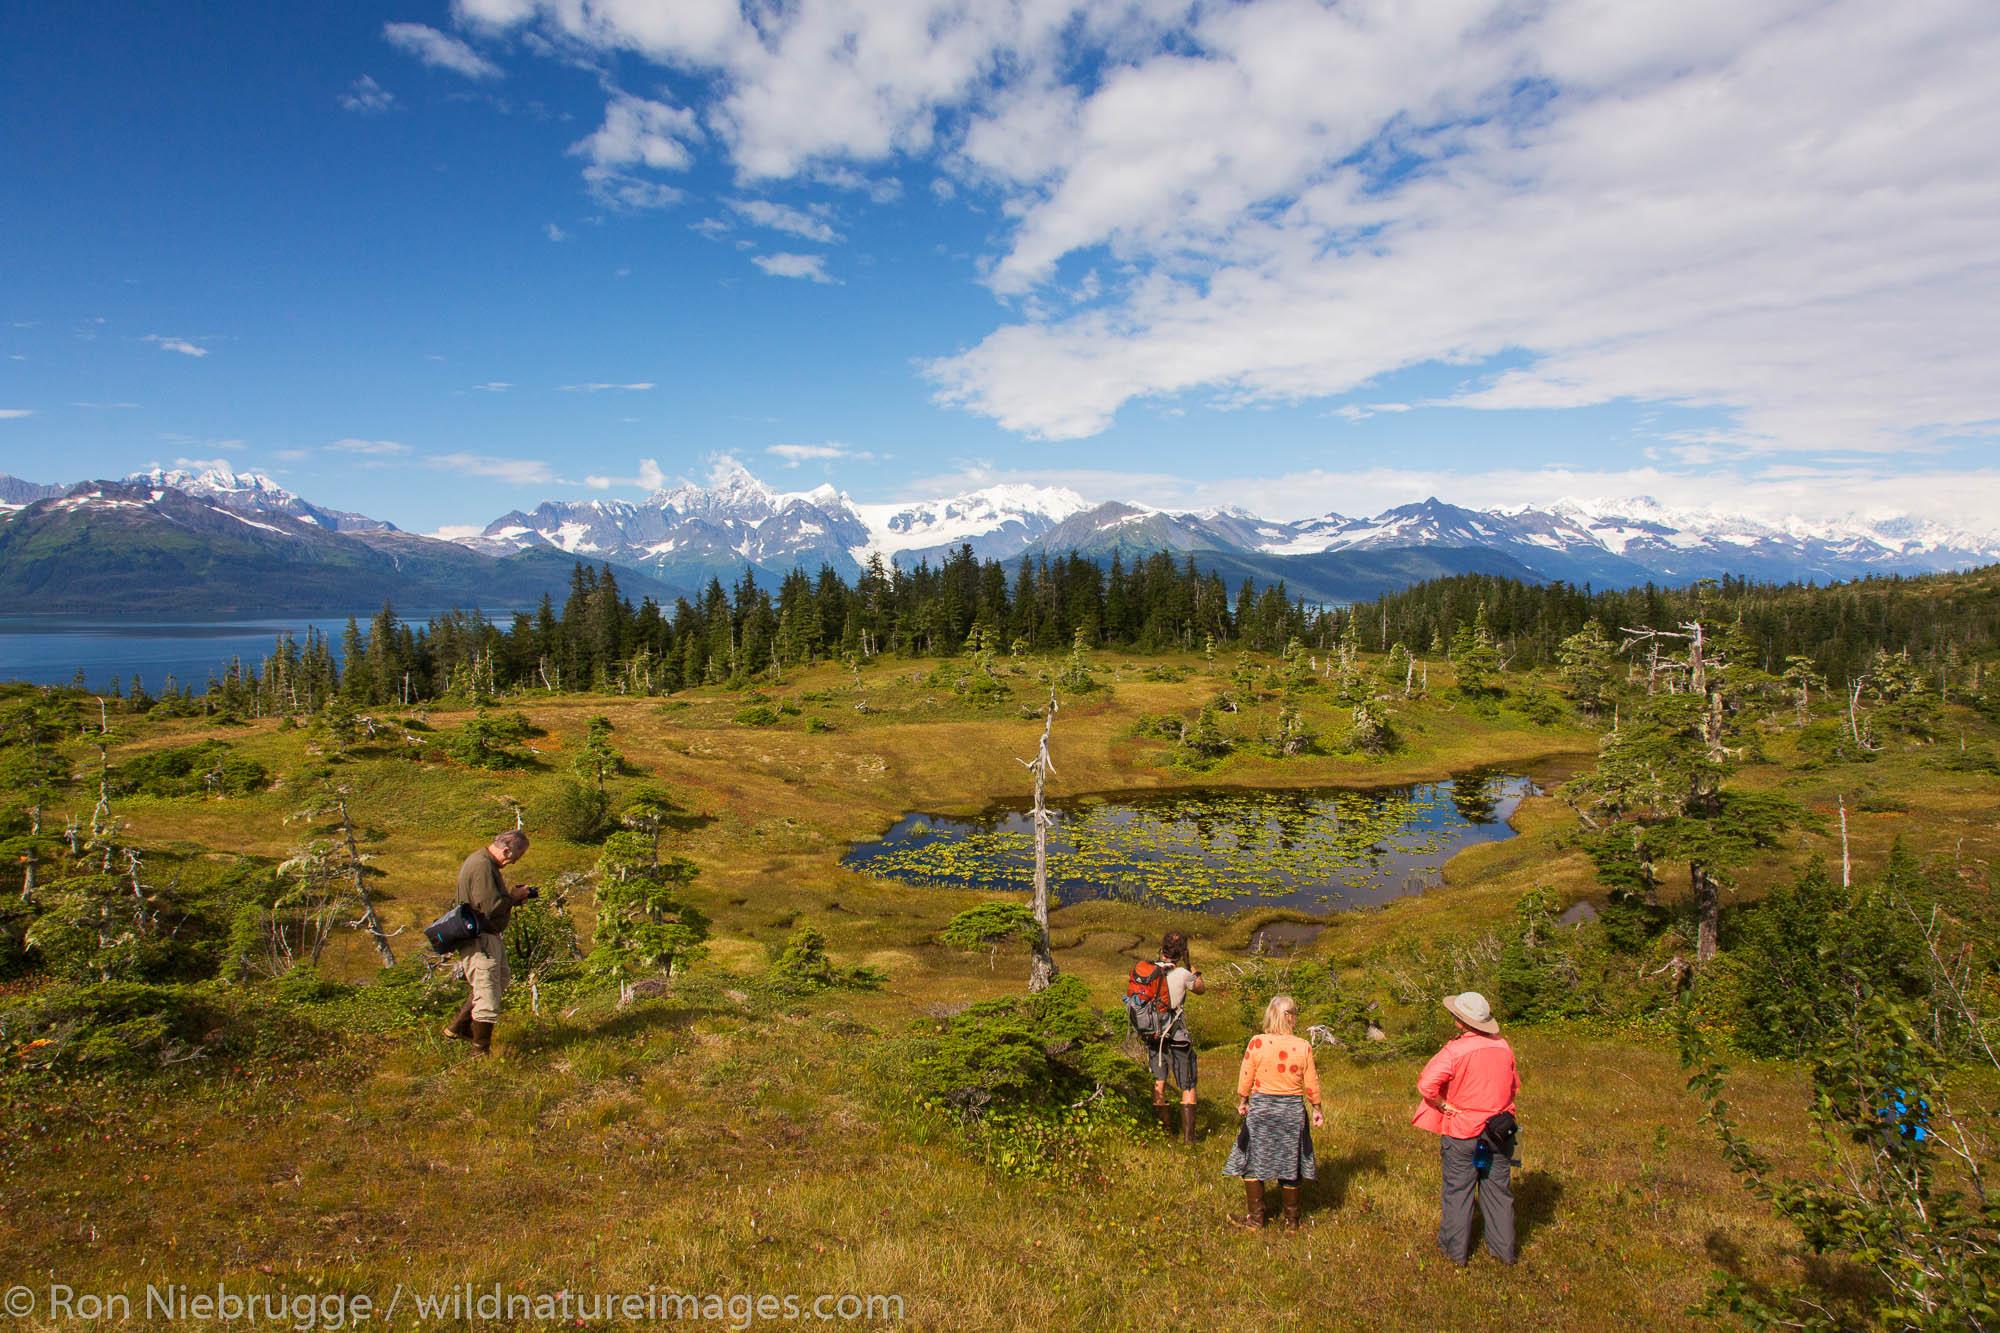 Hiking, Prince William Sound, Chugach National Forest, Alaska.